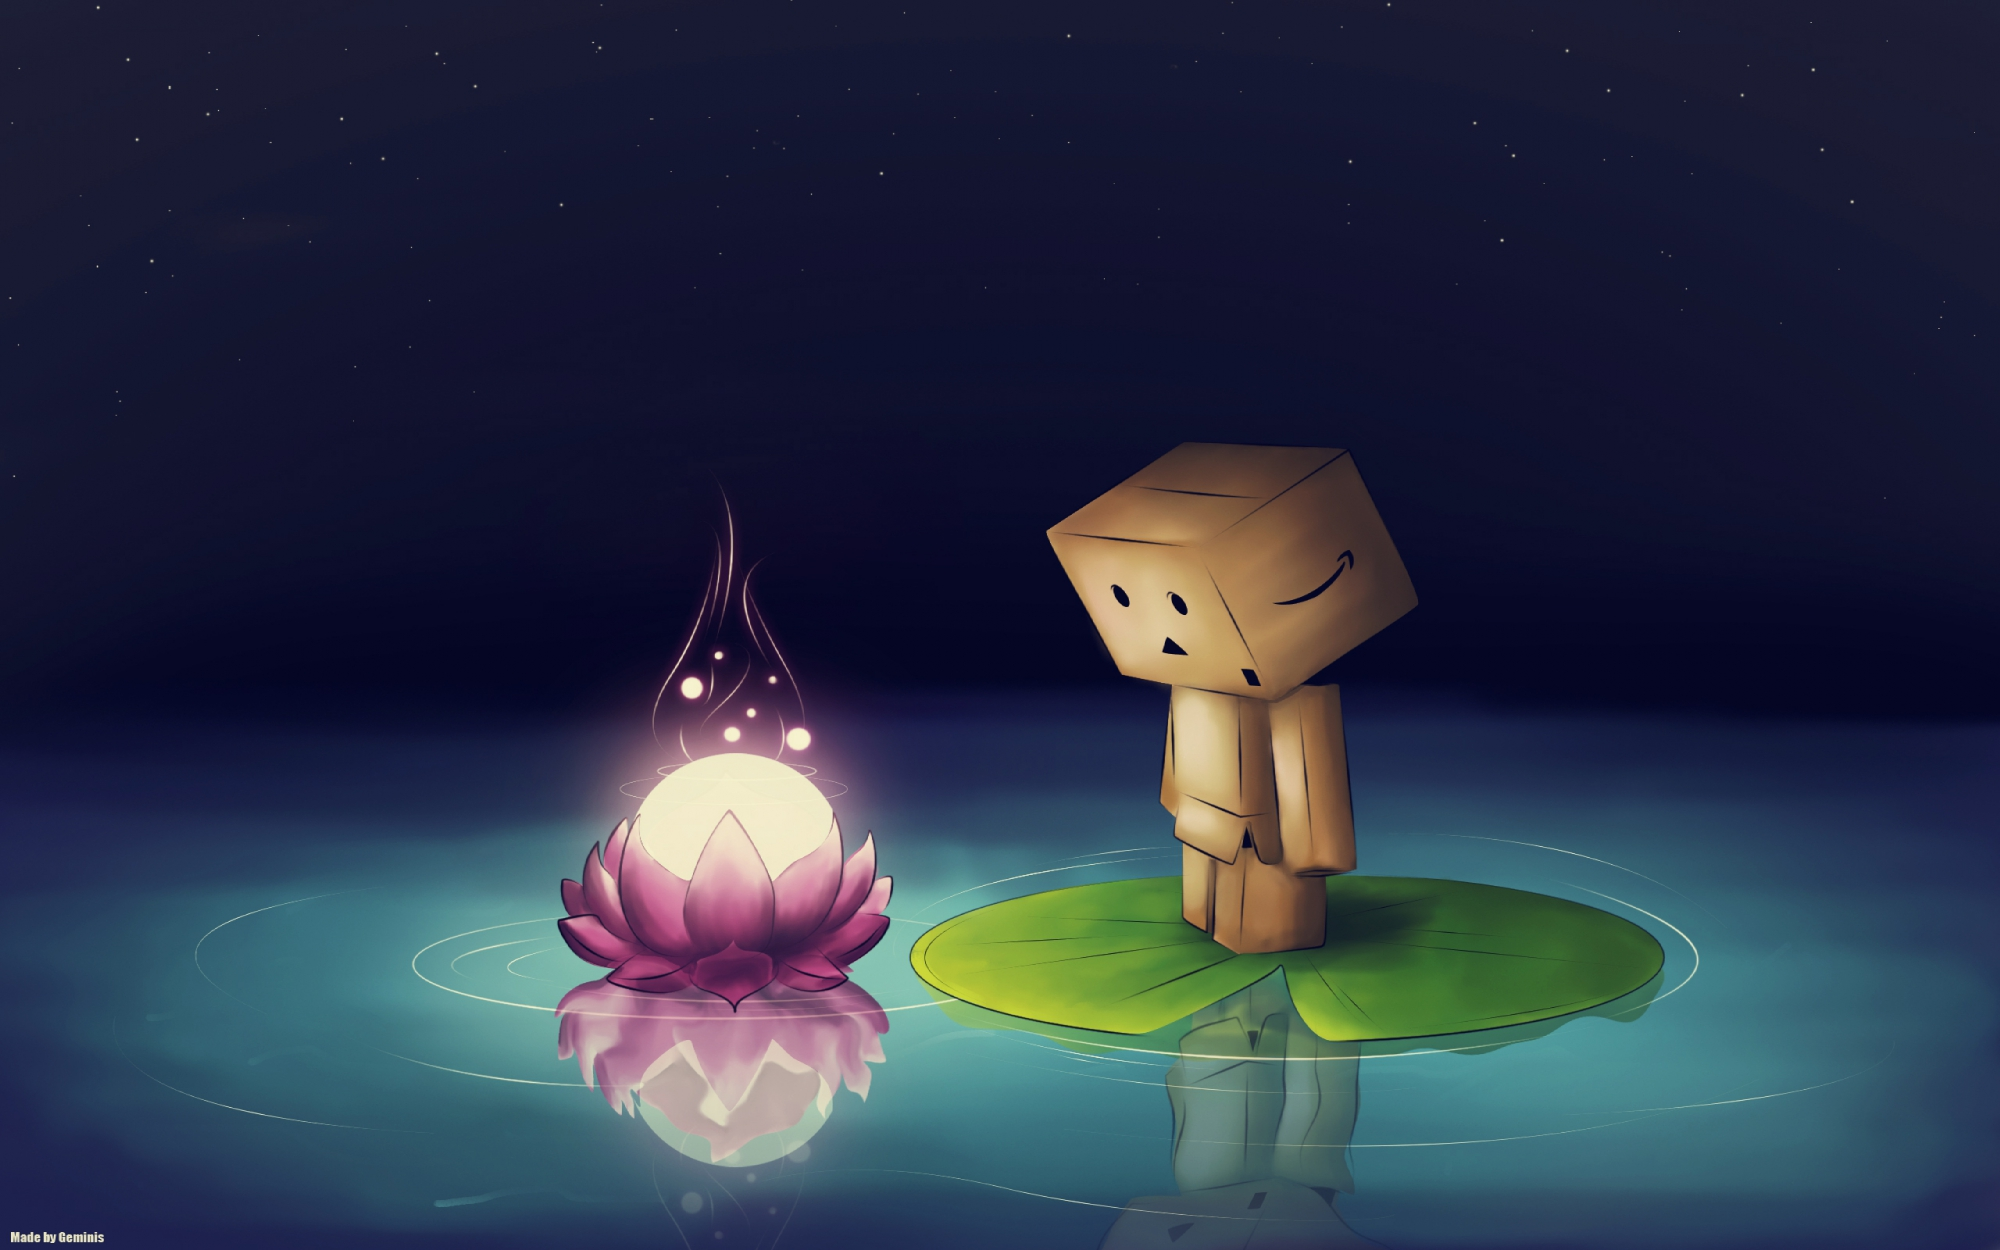 danboo reflection sky stars water yotsubato!